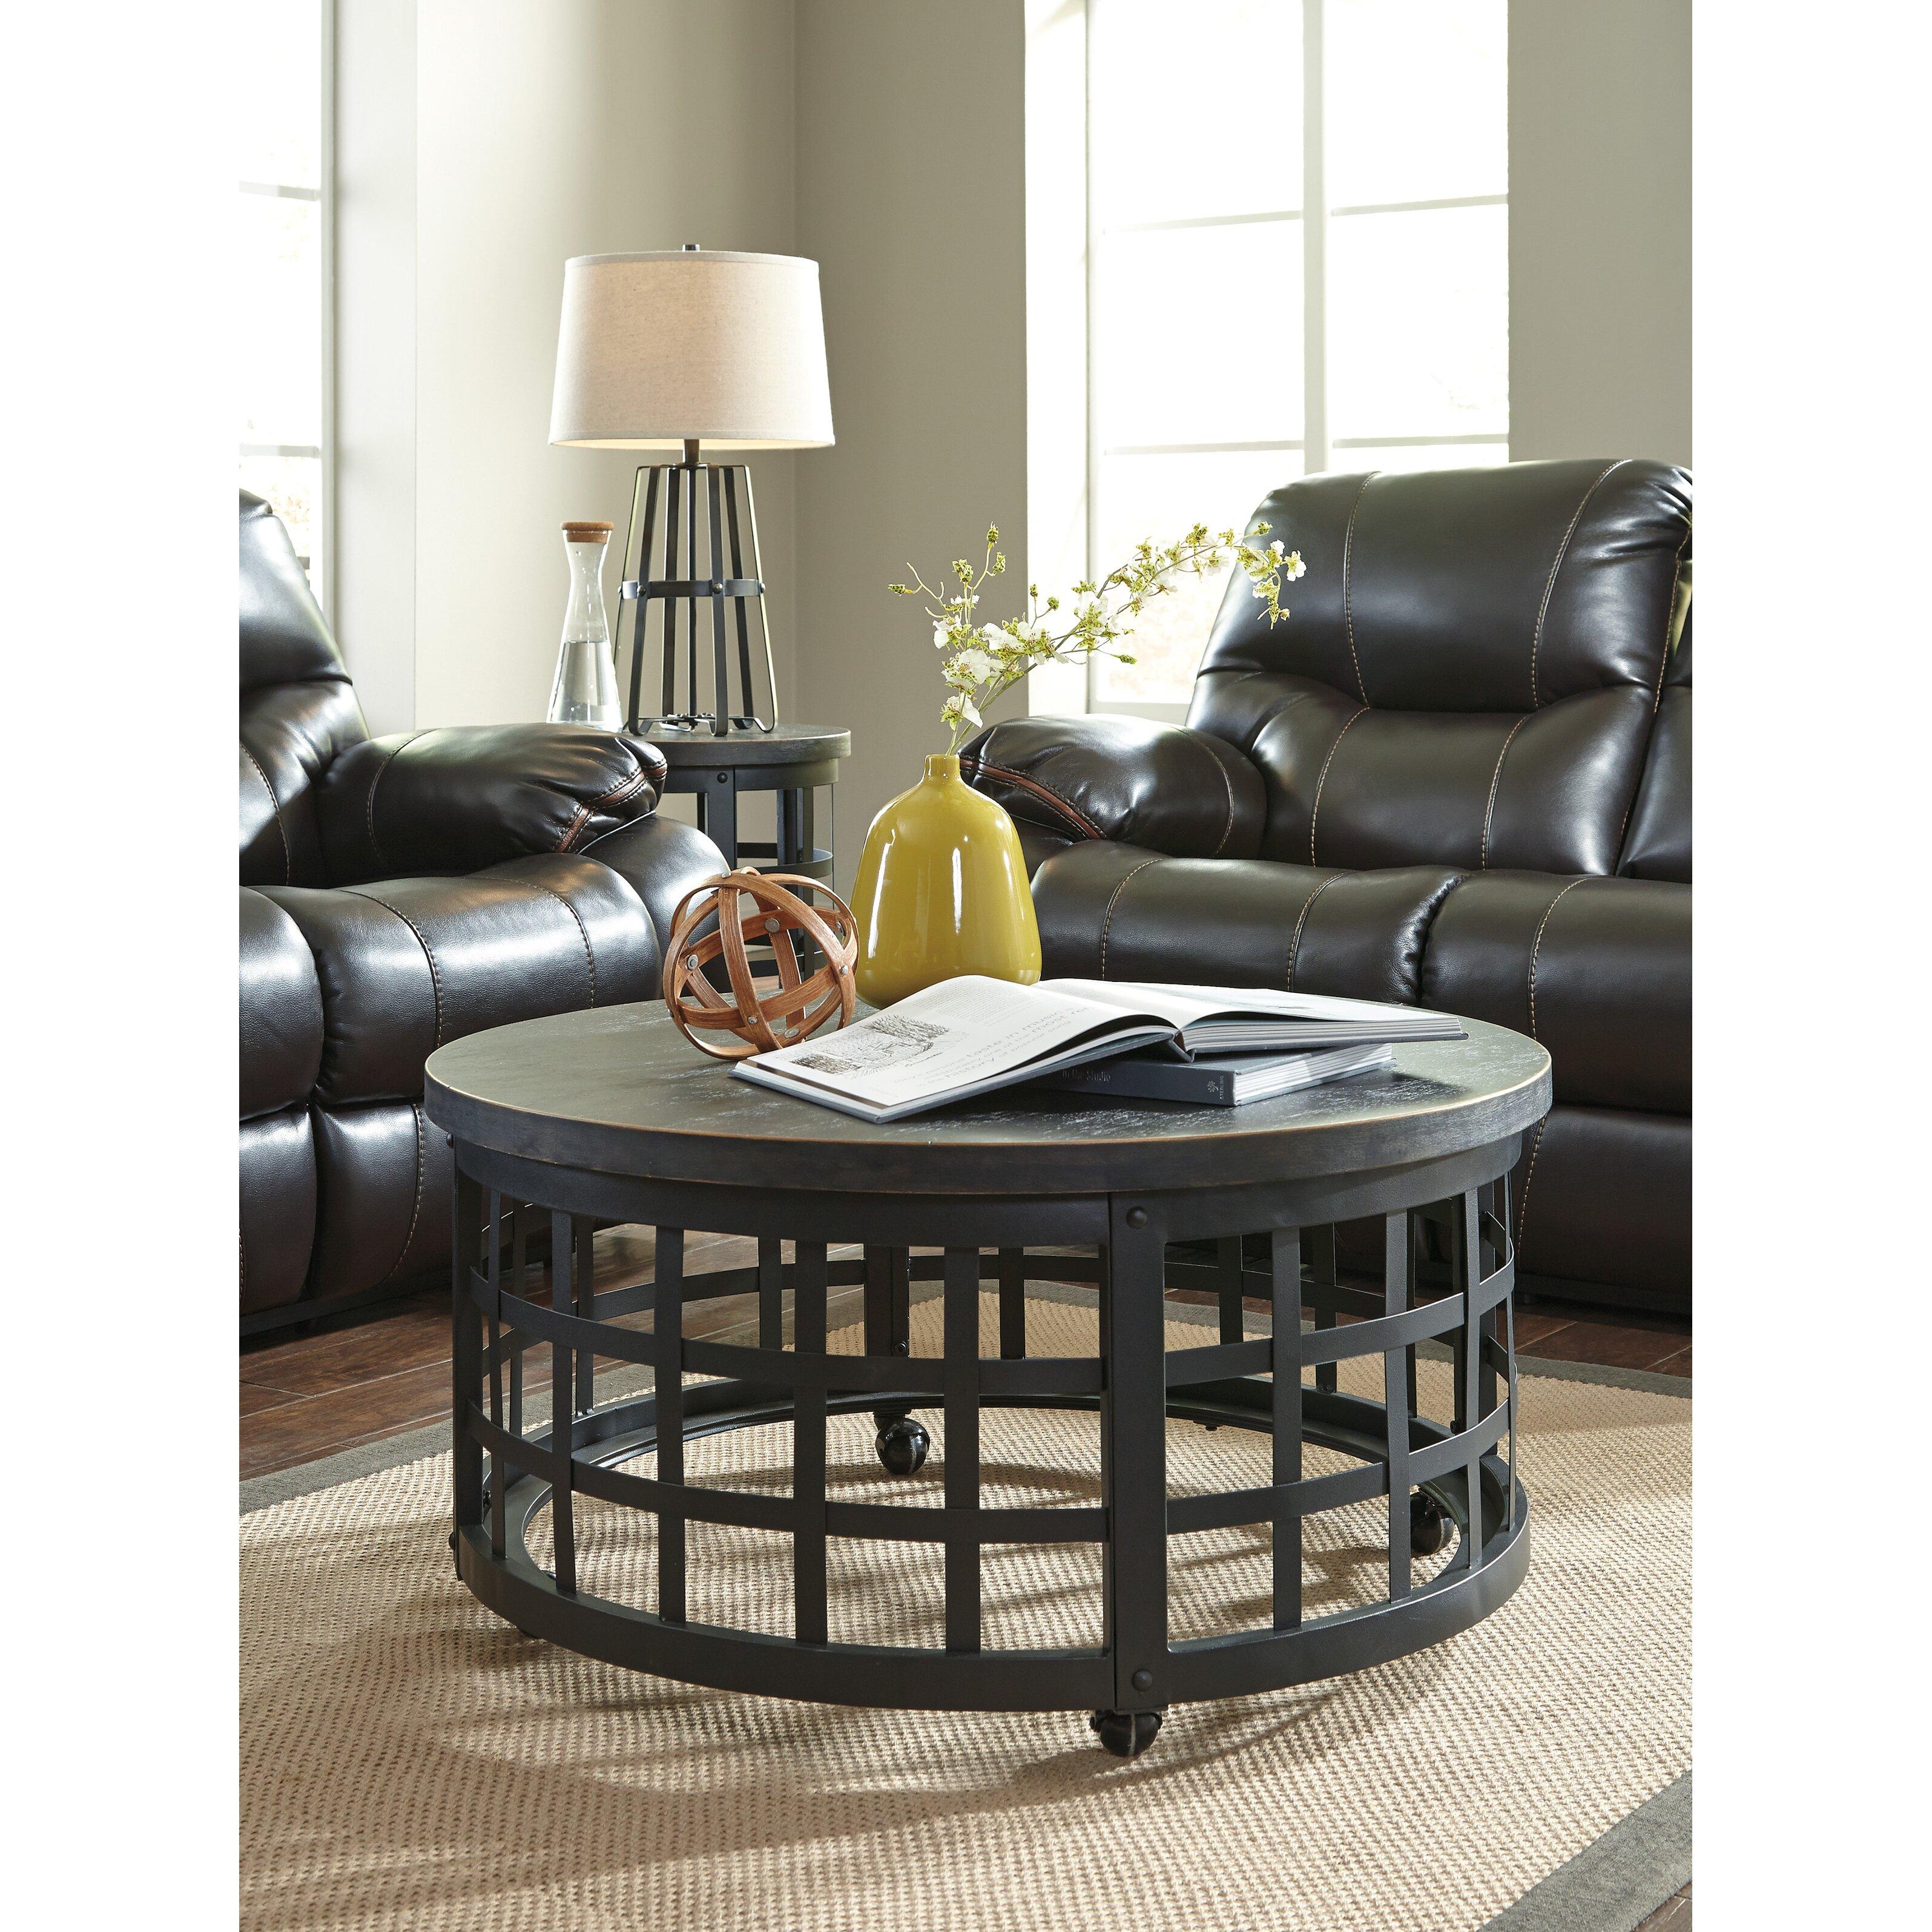 Wayfair Table: Signature Design By Ashley Marimon Coffee Table & Reviews